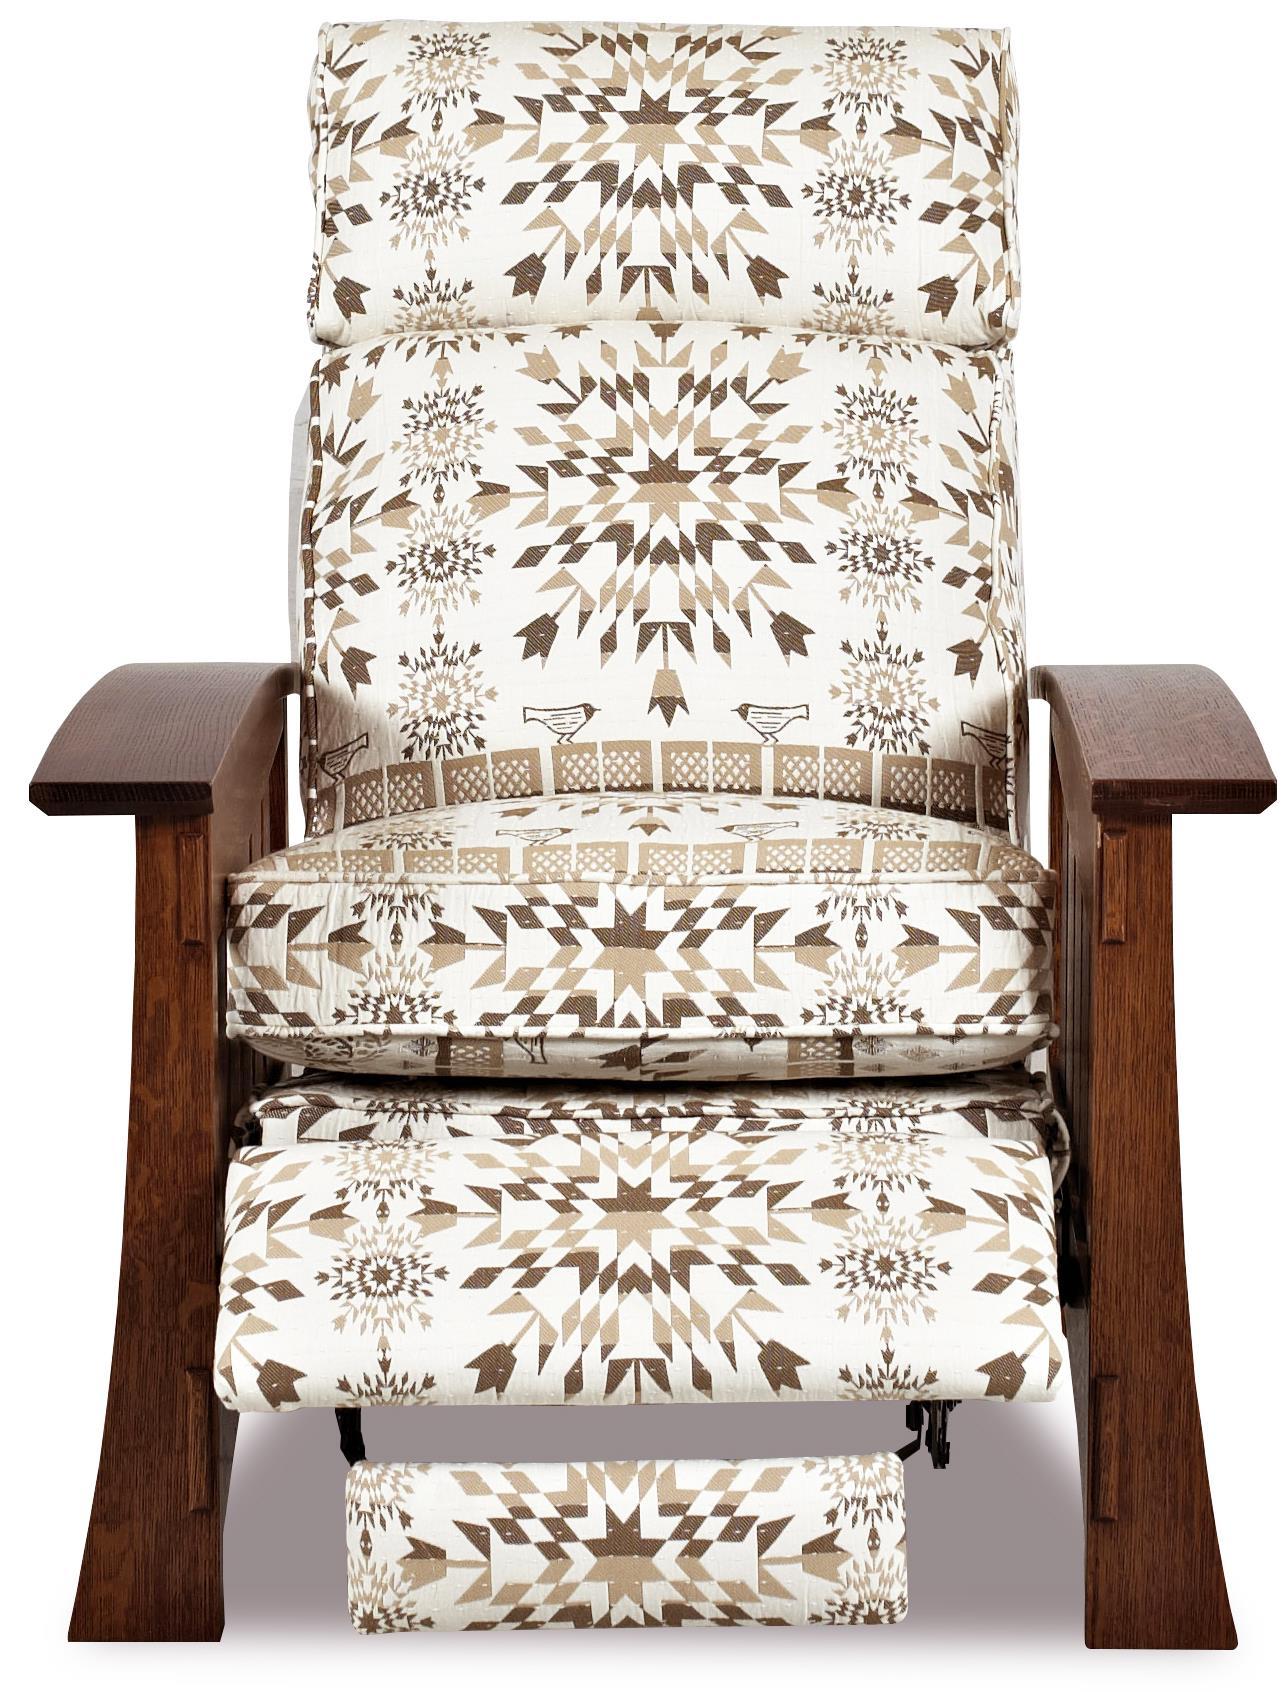 Highlands II High Leg Recliner by Comfort Design at Stuckey Furniture